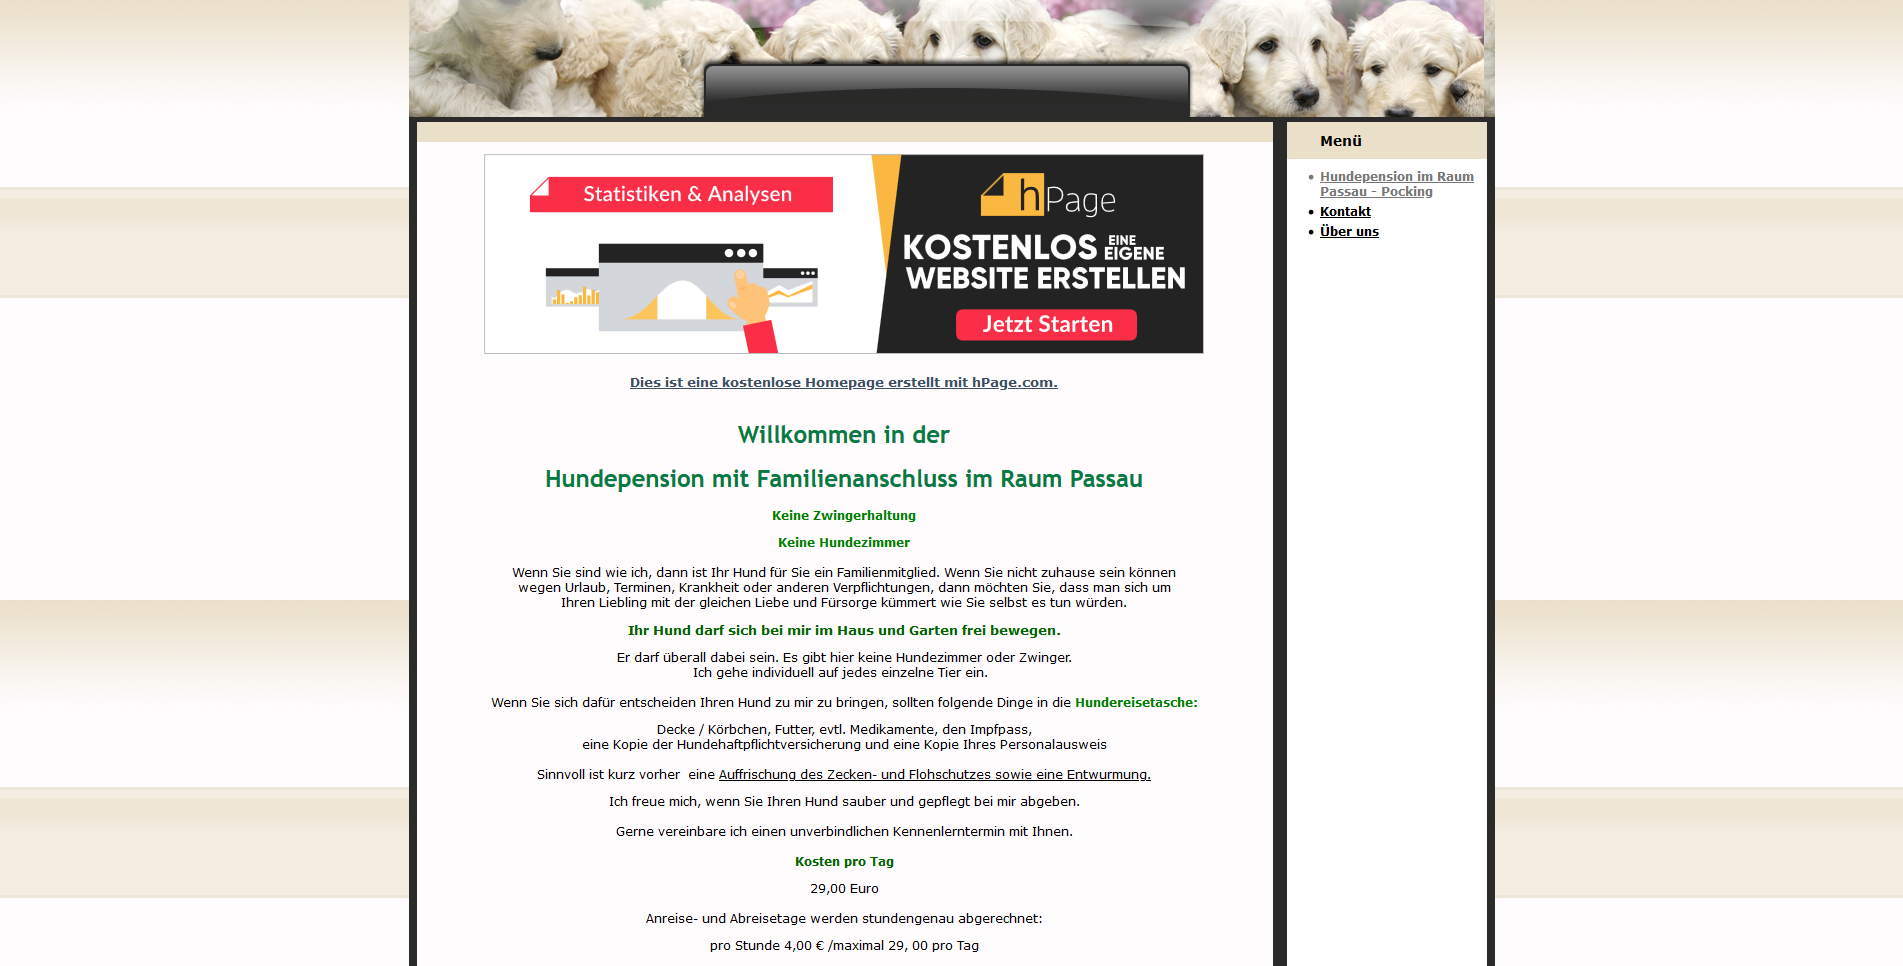 Hundepension Hundesitter Passau